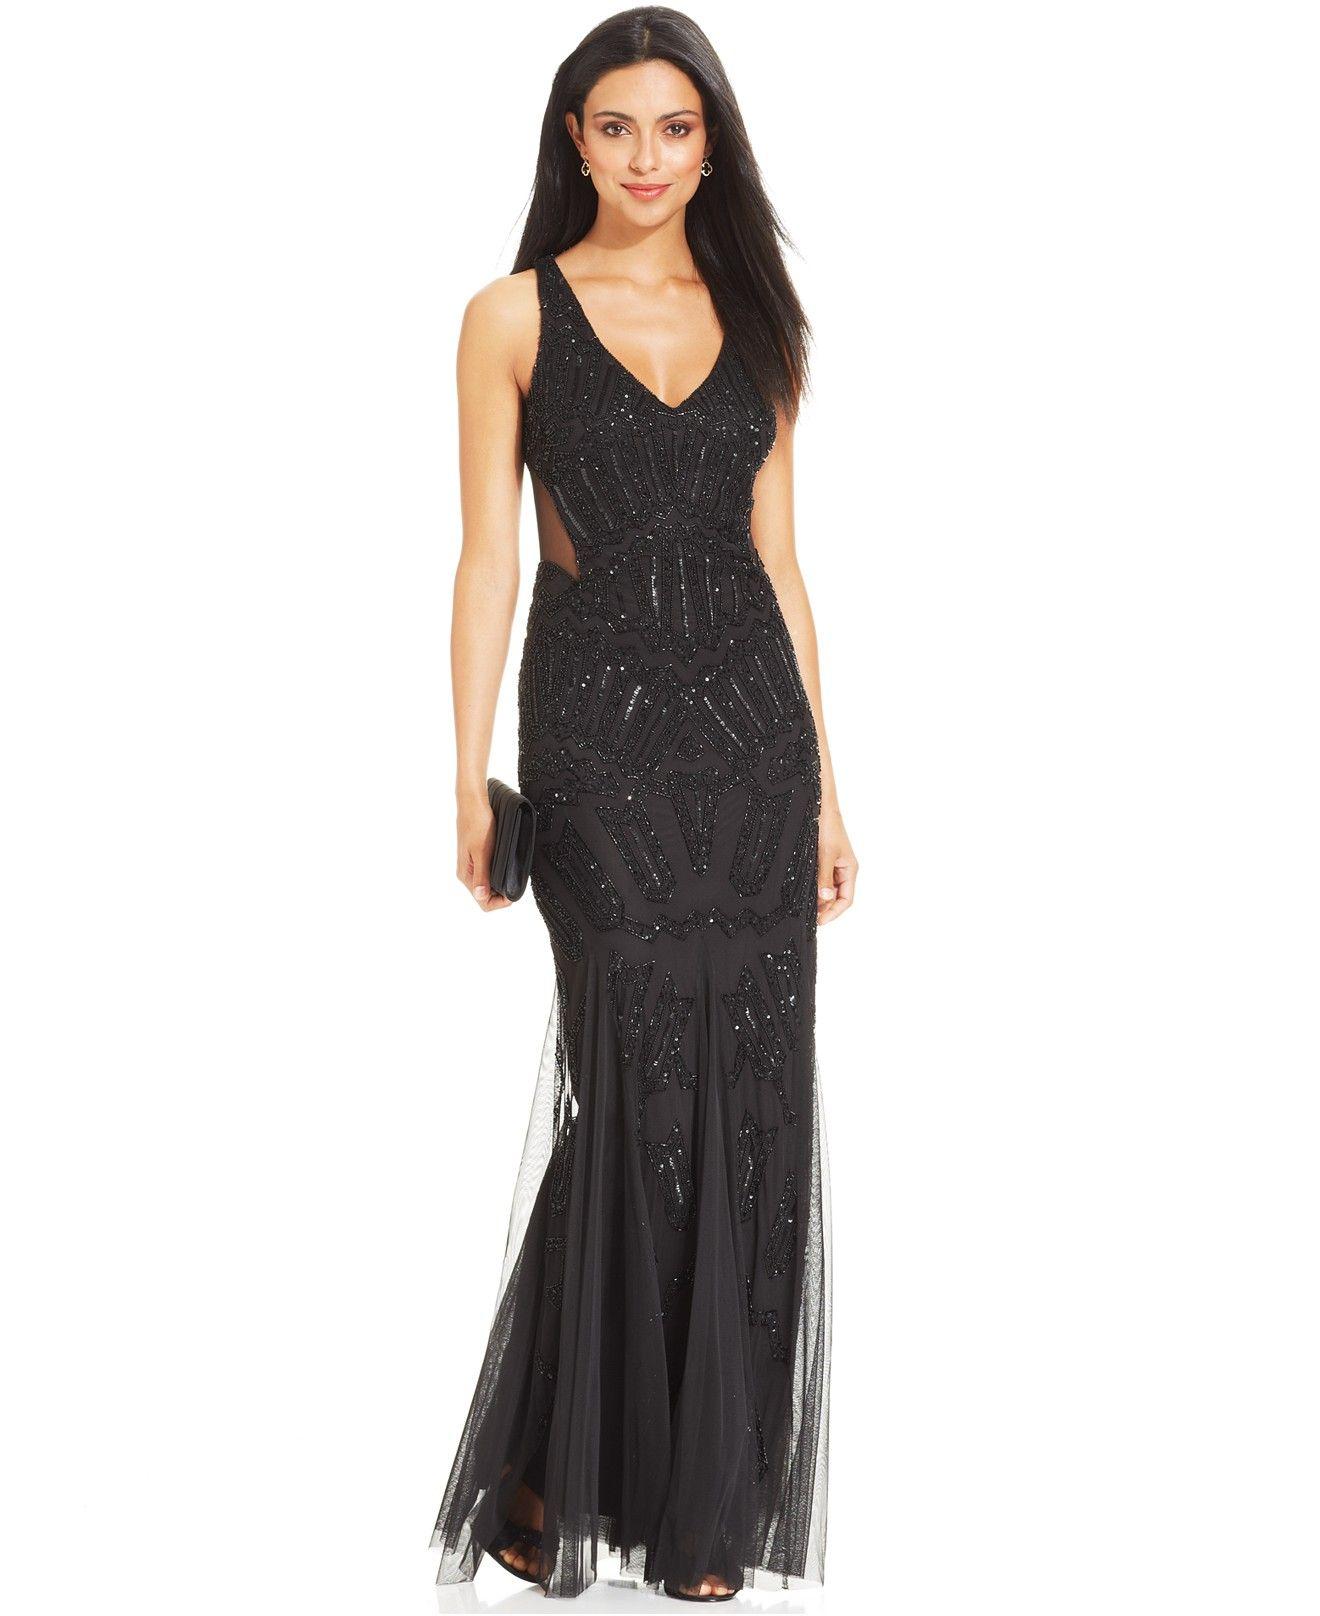 Adrianna Papell Evening Dress Macys